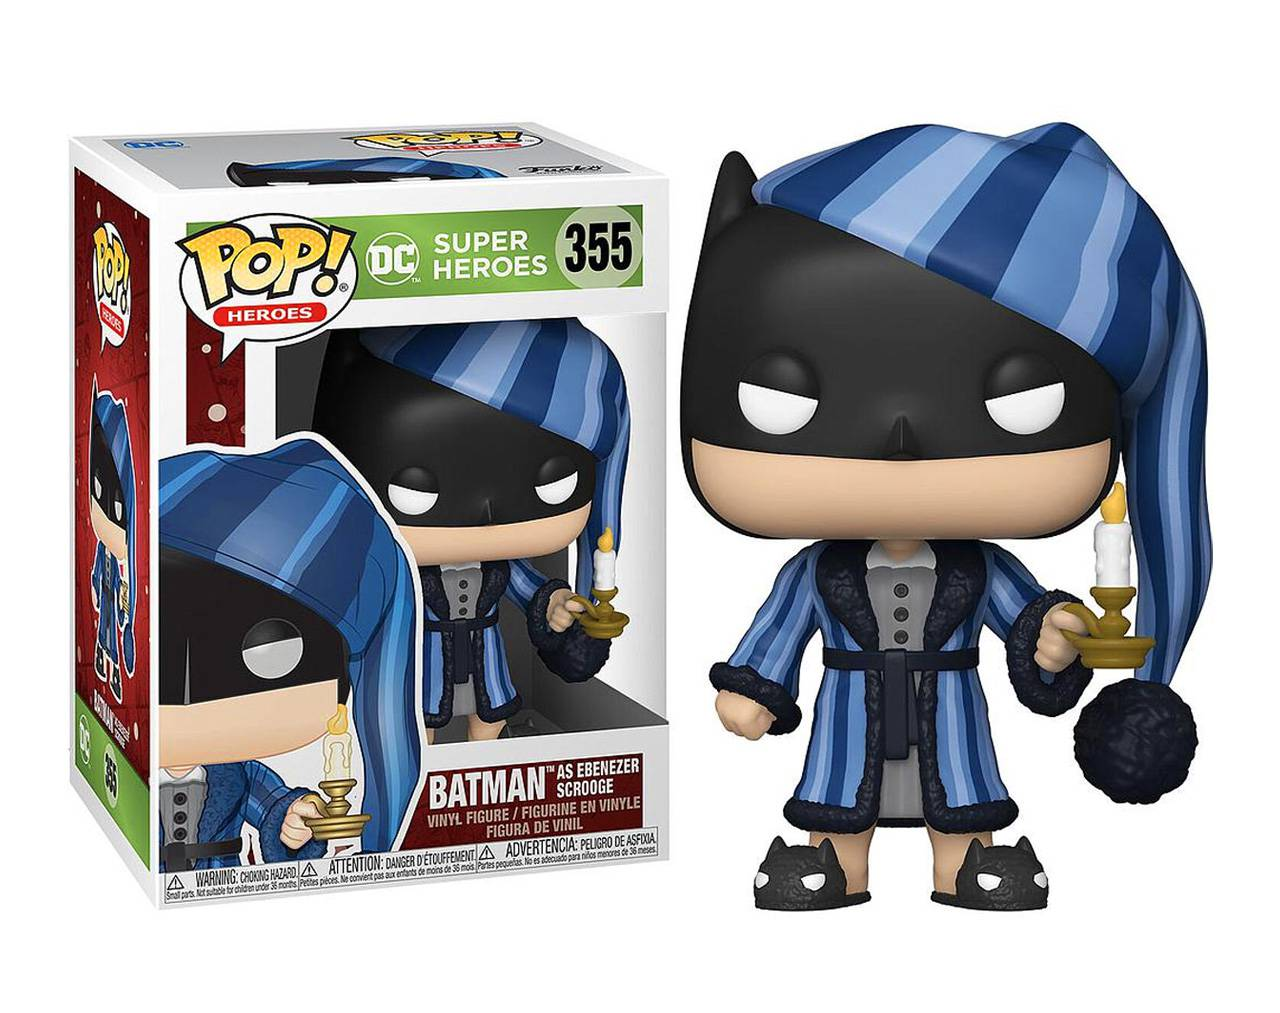 Batman as Ebenezer Scrooge Pop! Vinyl